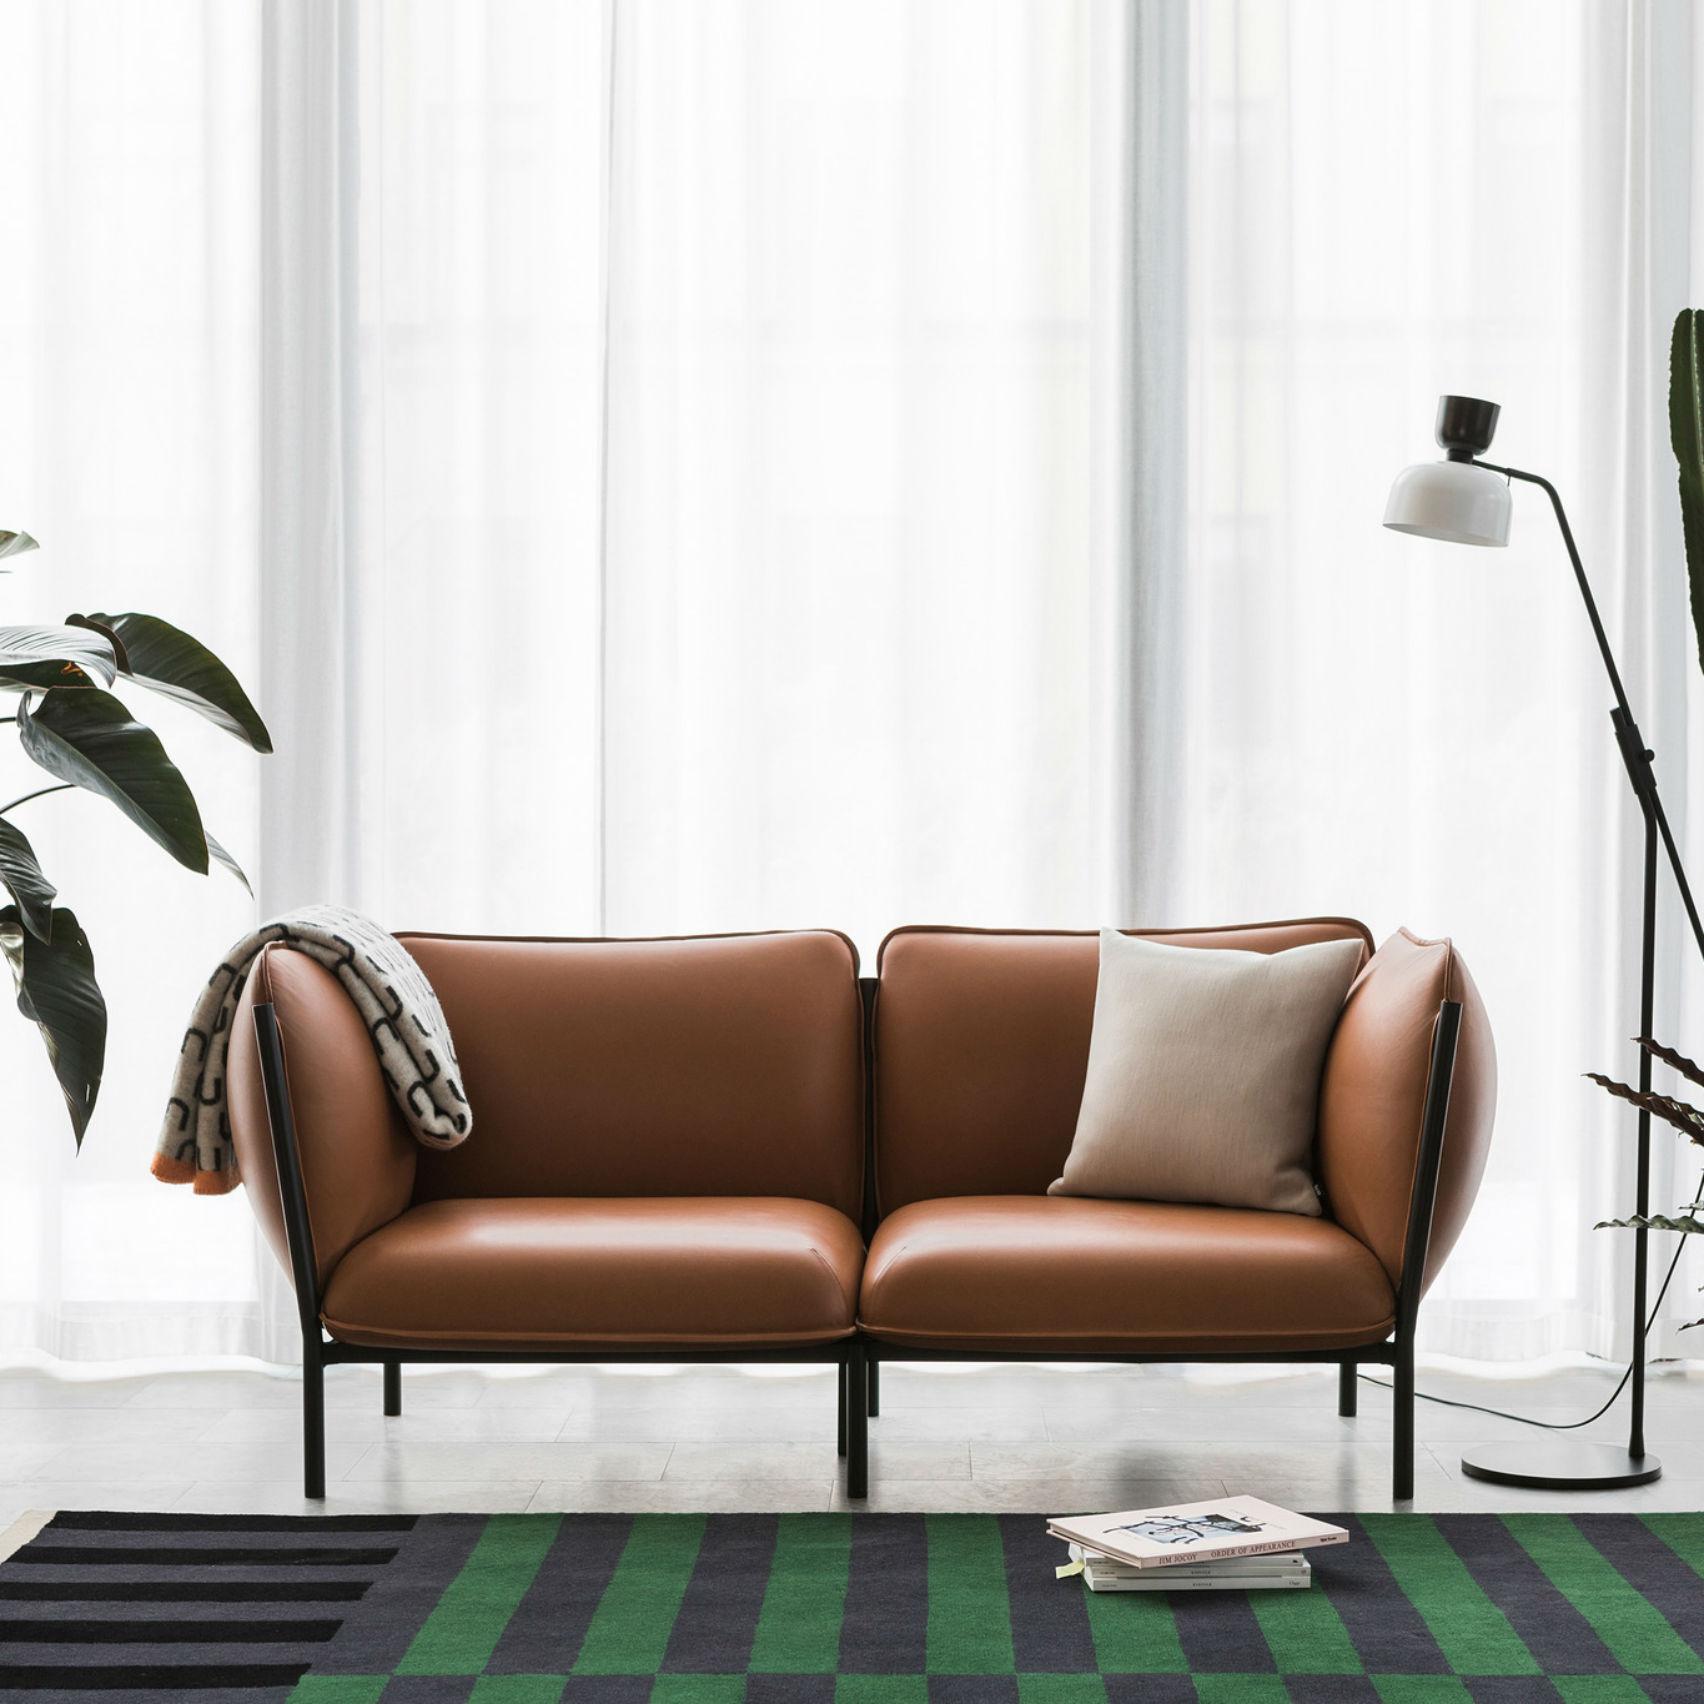 Kumo Modular Sofa By Anderssen Voll For Hem Dezeen Awards